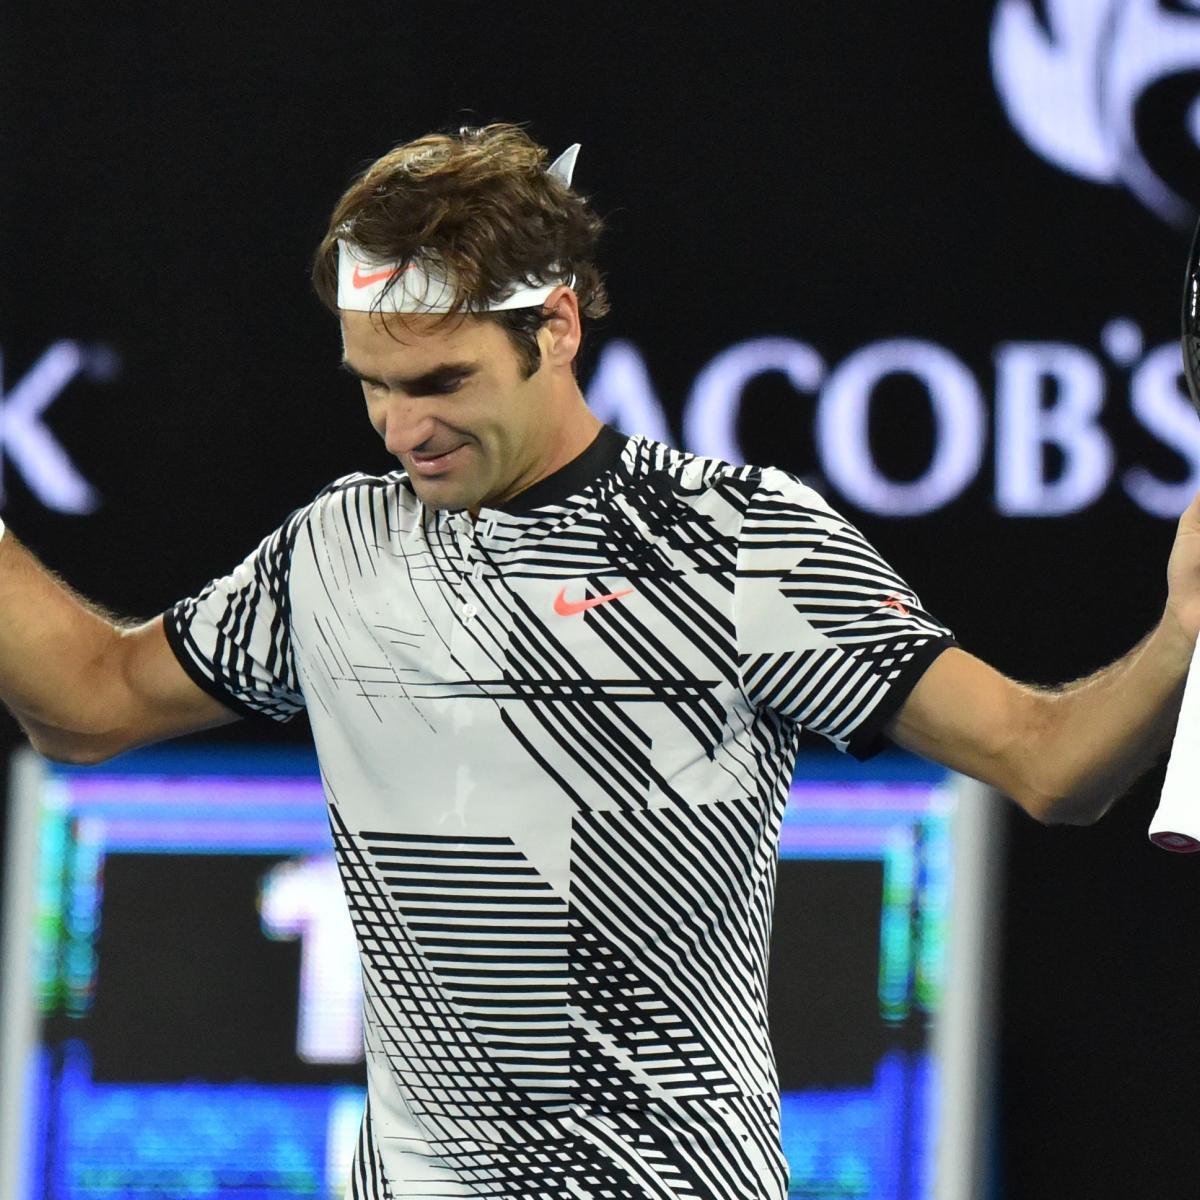 Australian Open 2017 Men's Final: TV Schedule, Start Time